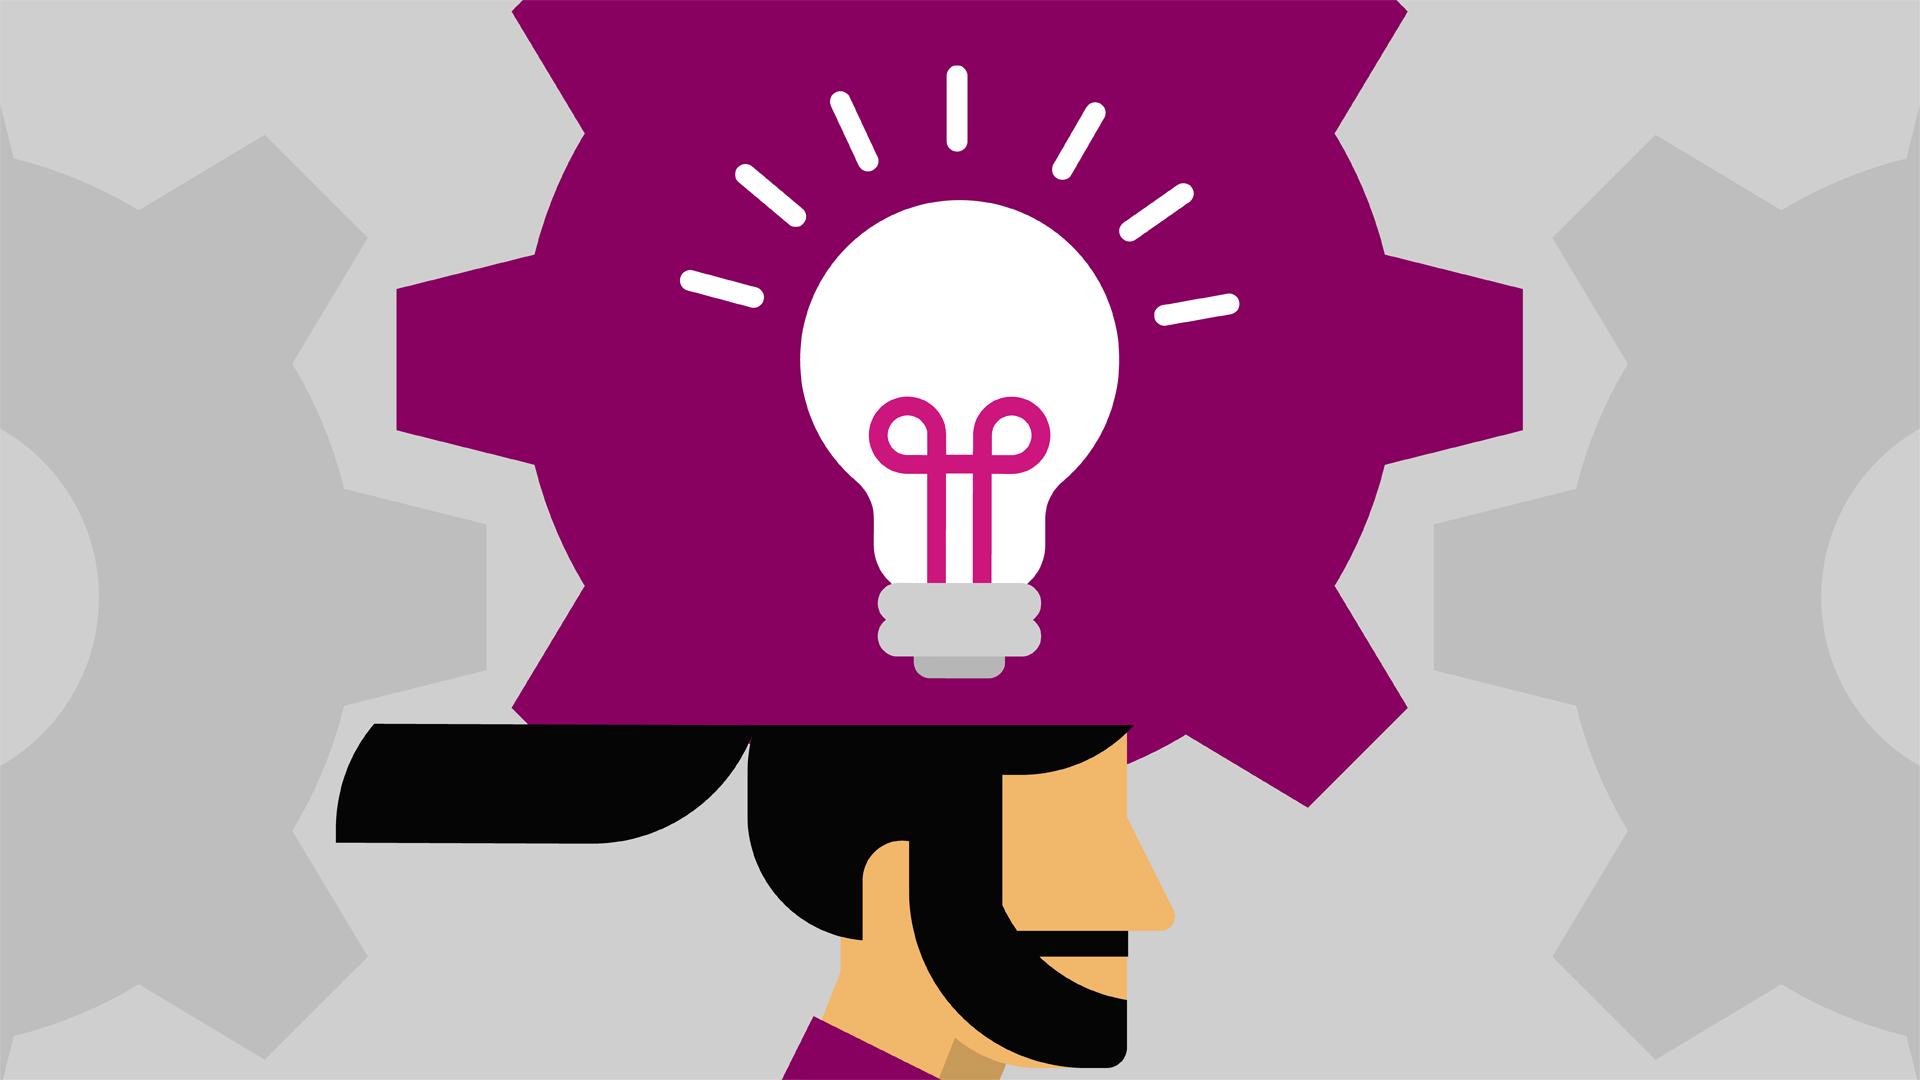 creative group name - TechNoven